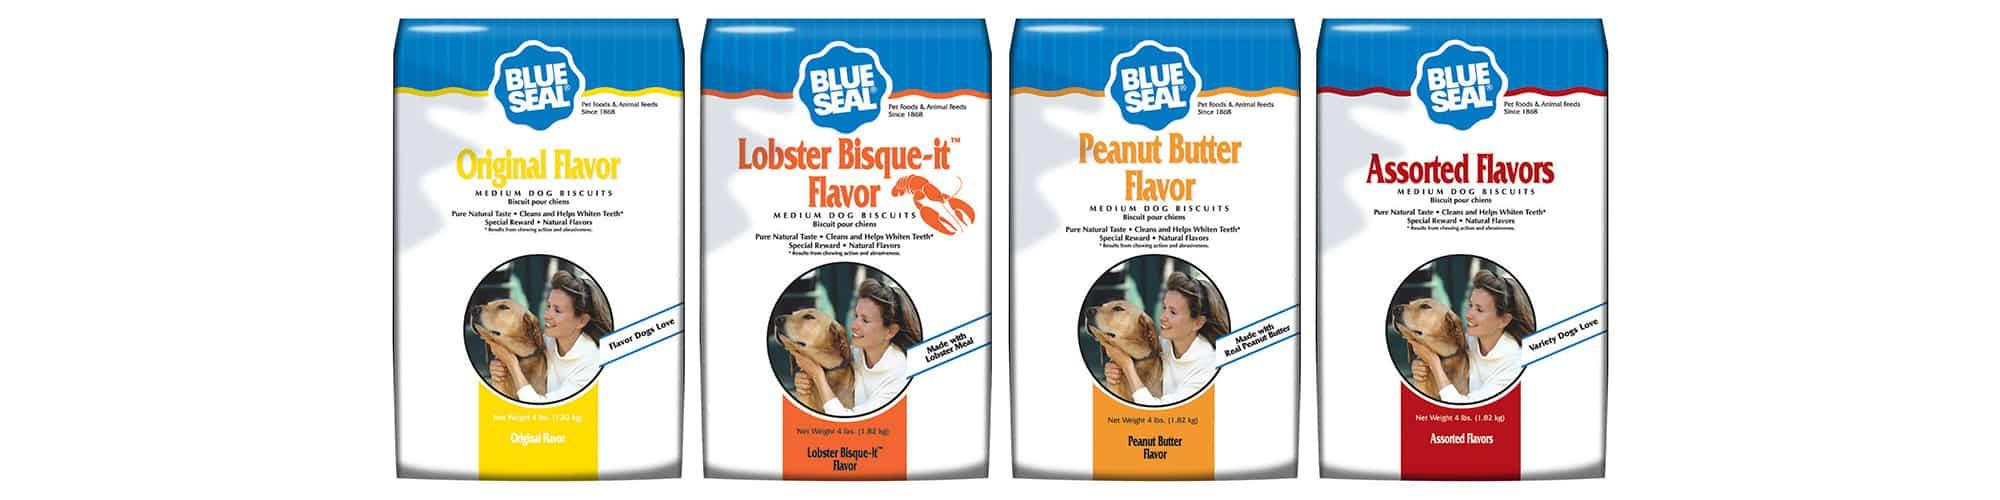 Blue Seal Dog Food: 2020 Review, Recalls & Coupons 3